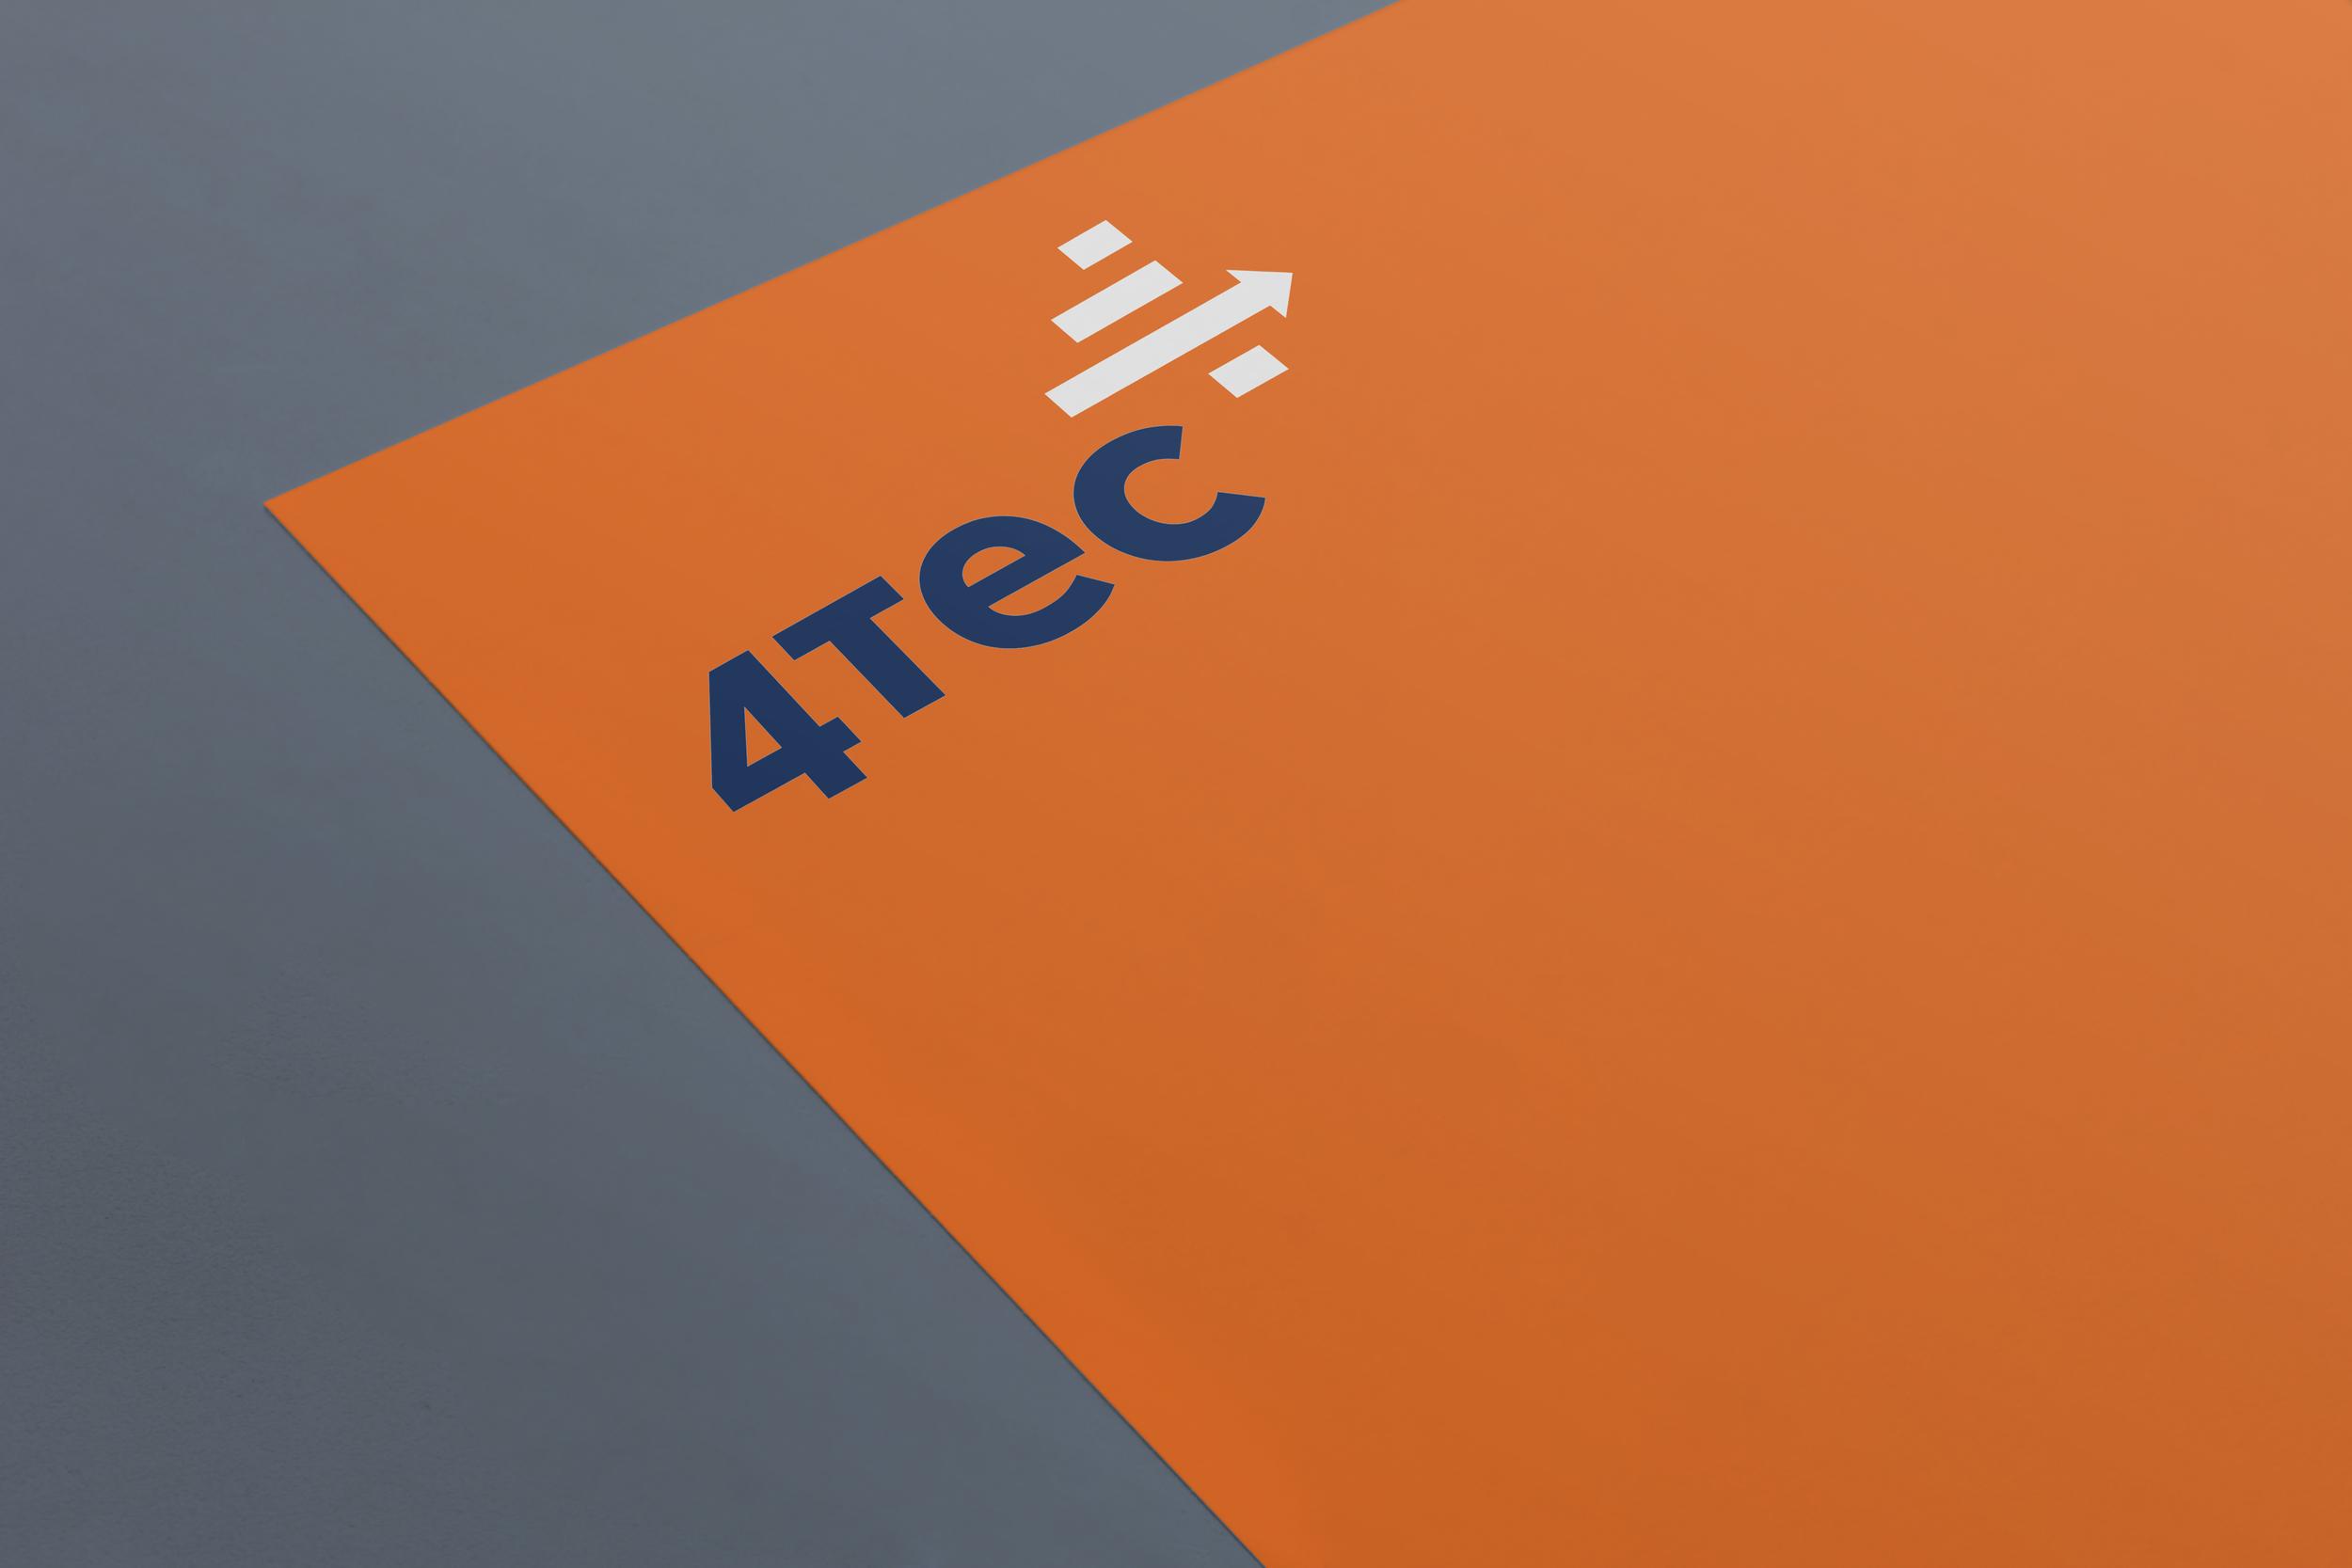 4tec  Logotipo e identidad visual